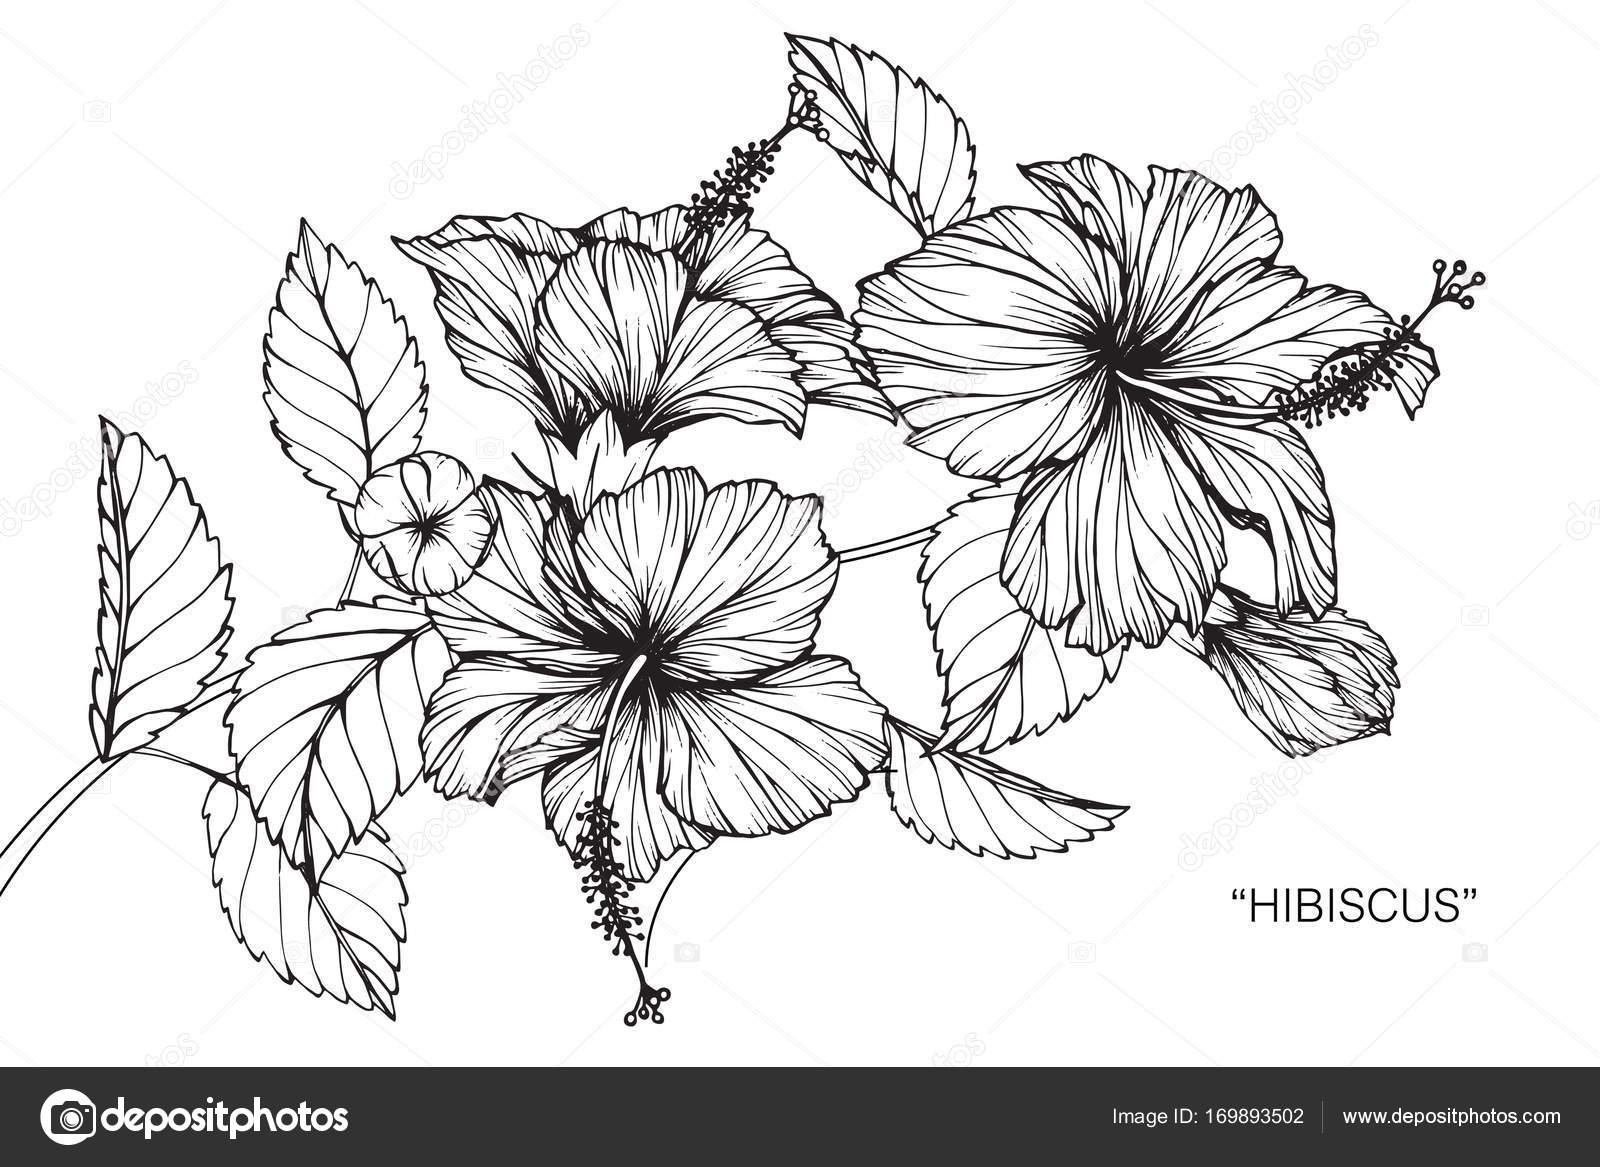 Hibiscus Flower Drawing Sketch Black White Line Art